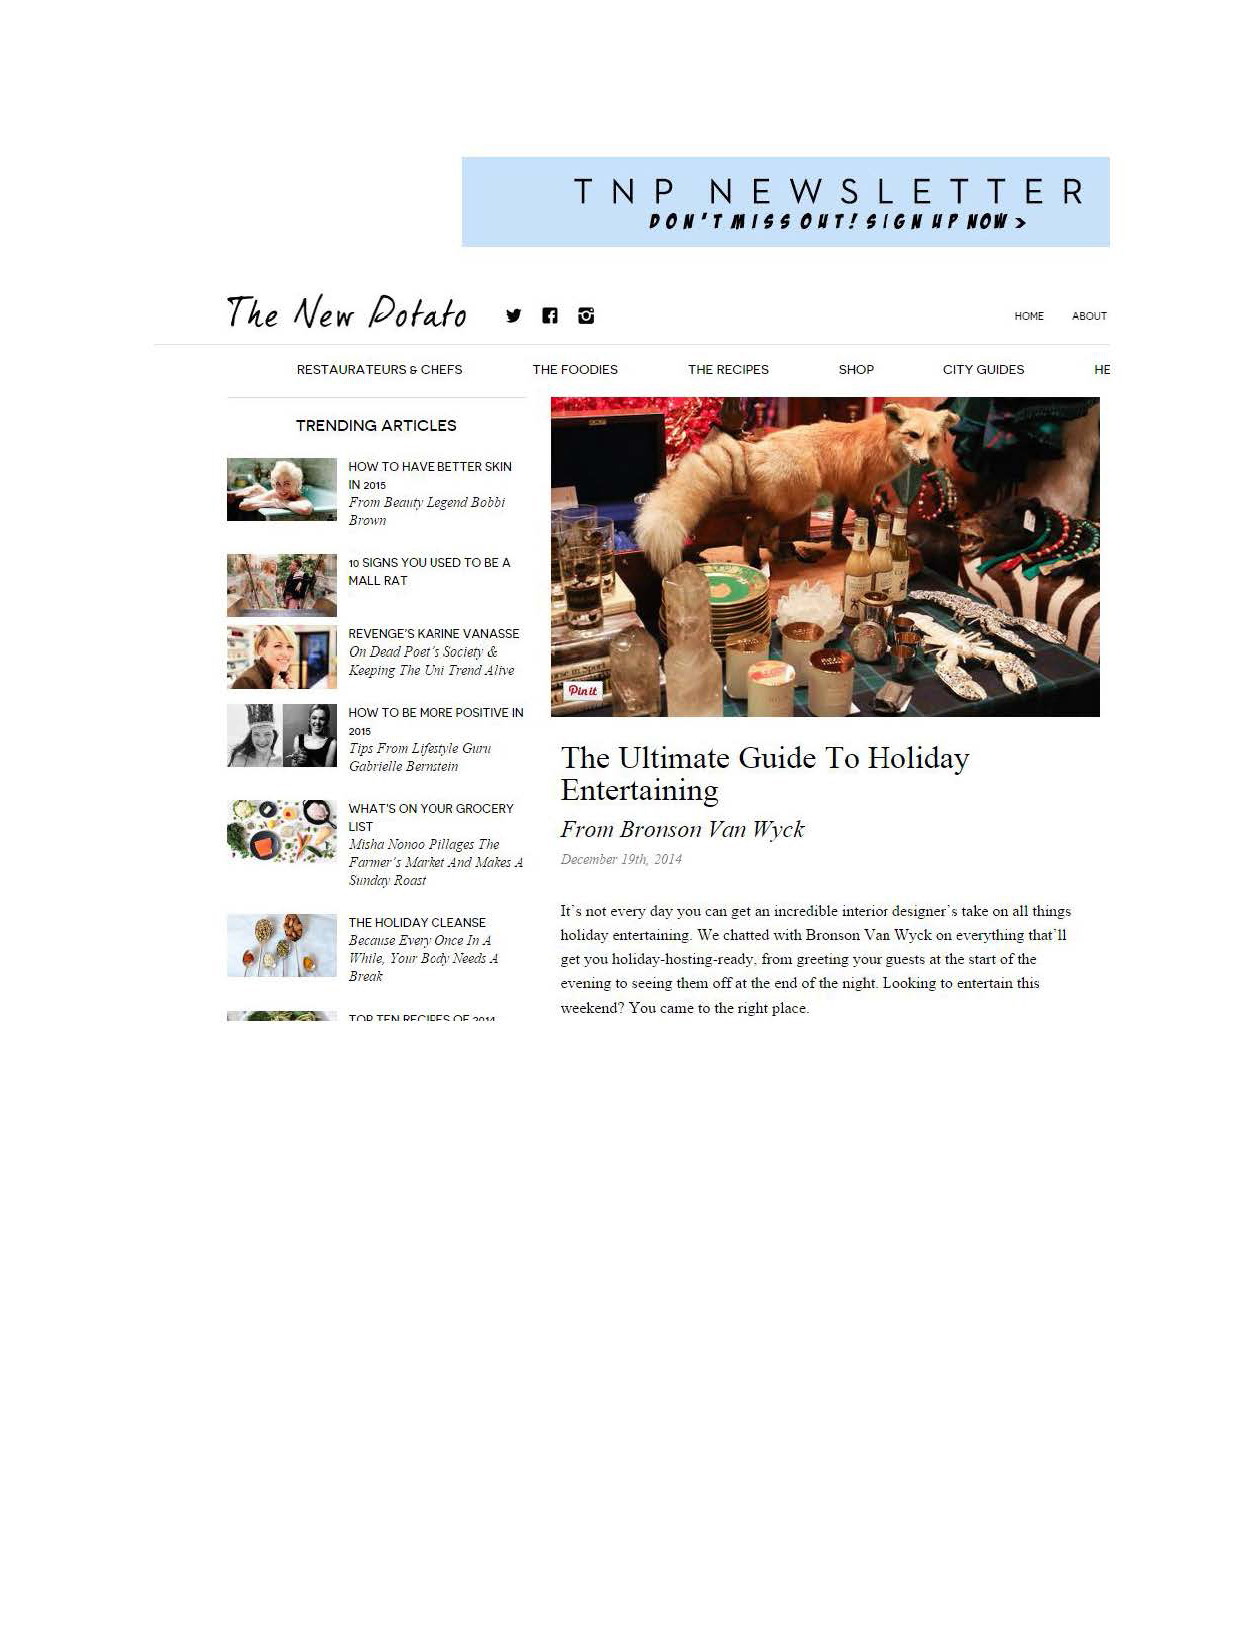 THE NEW POTATO_Holiday Entertaining 12-19-14 - edit 4 (1).jpg